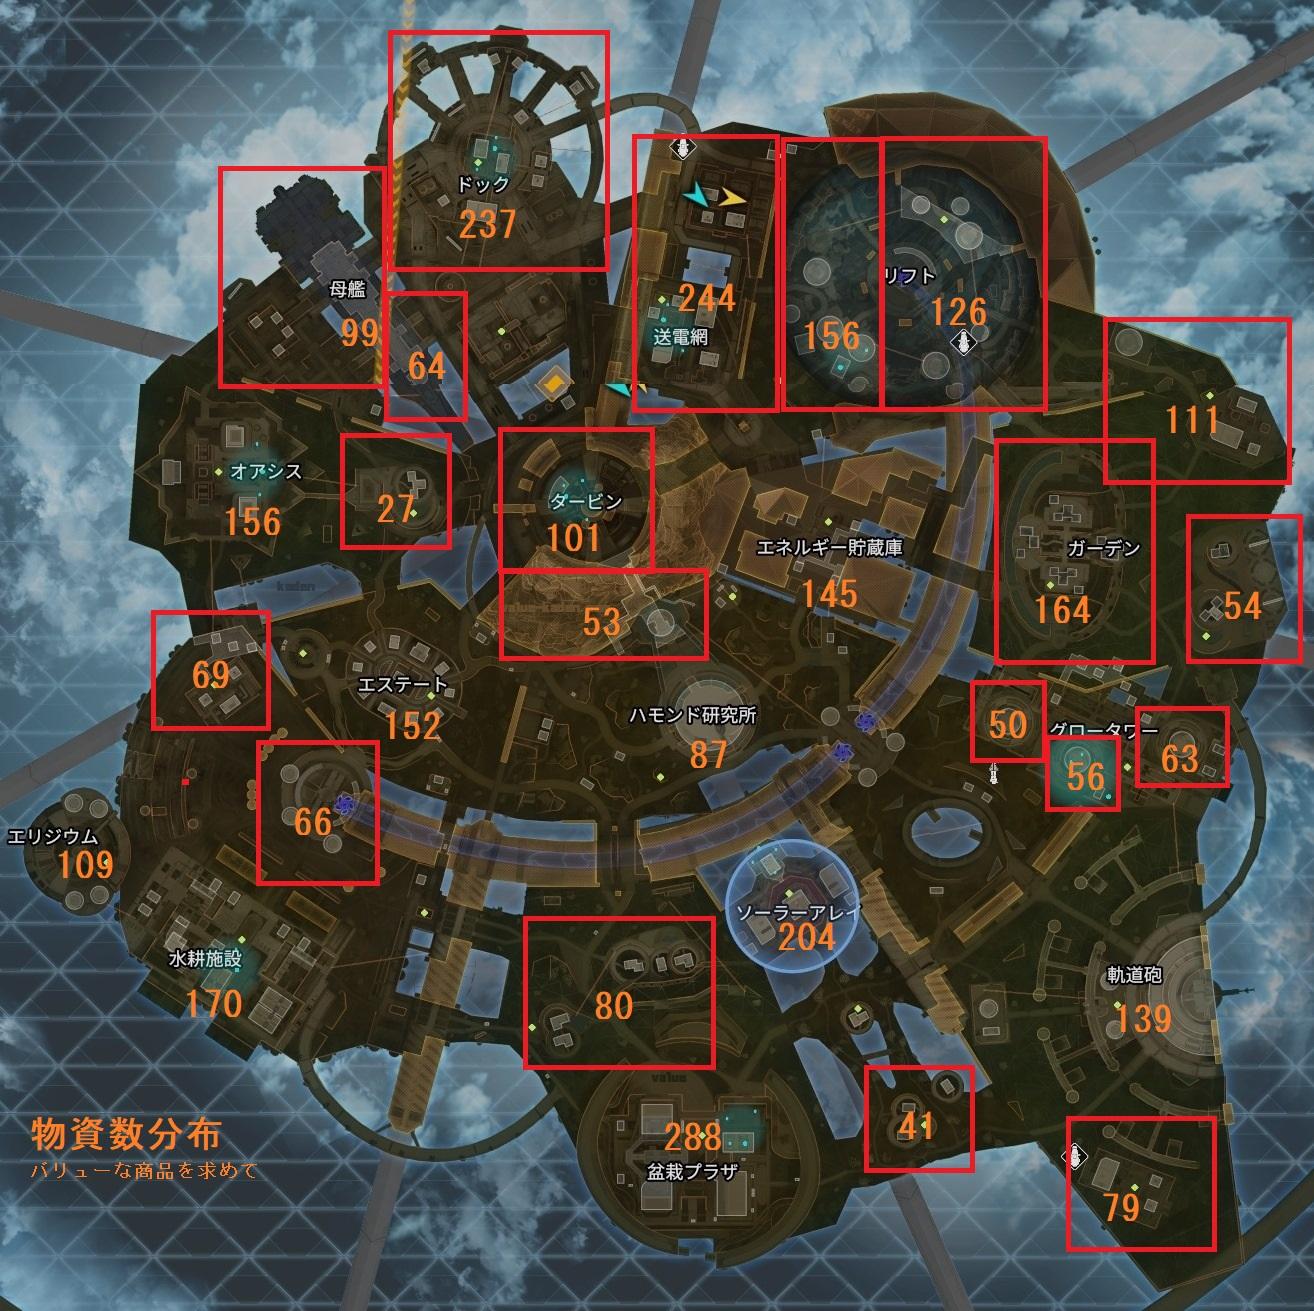 【Apex Legends】オリンパスの物資分布マップ